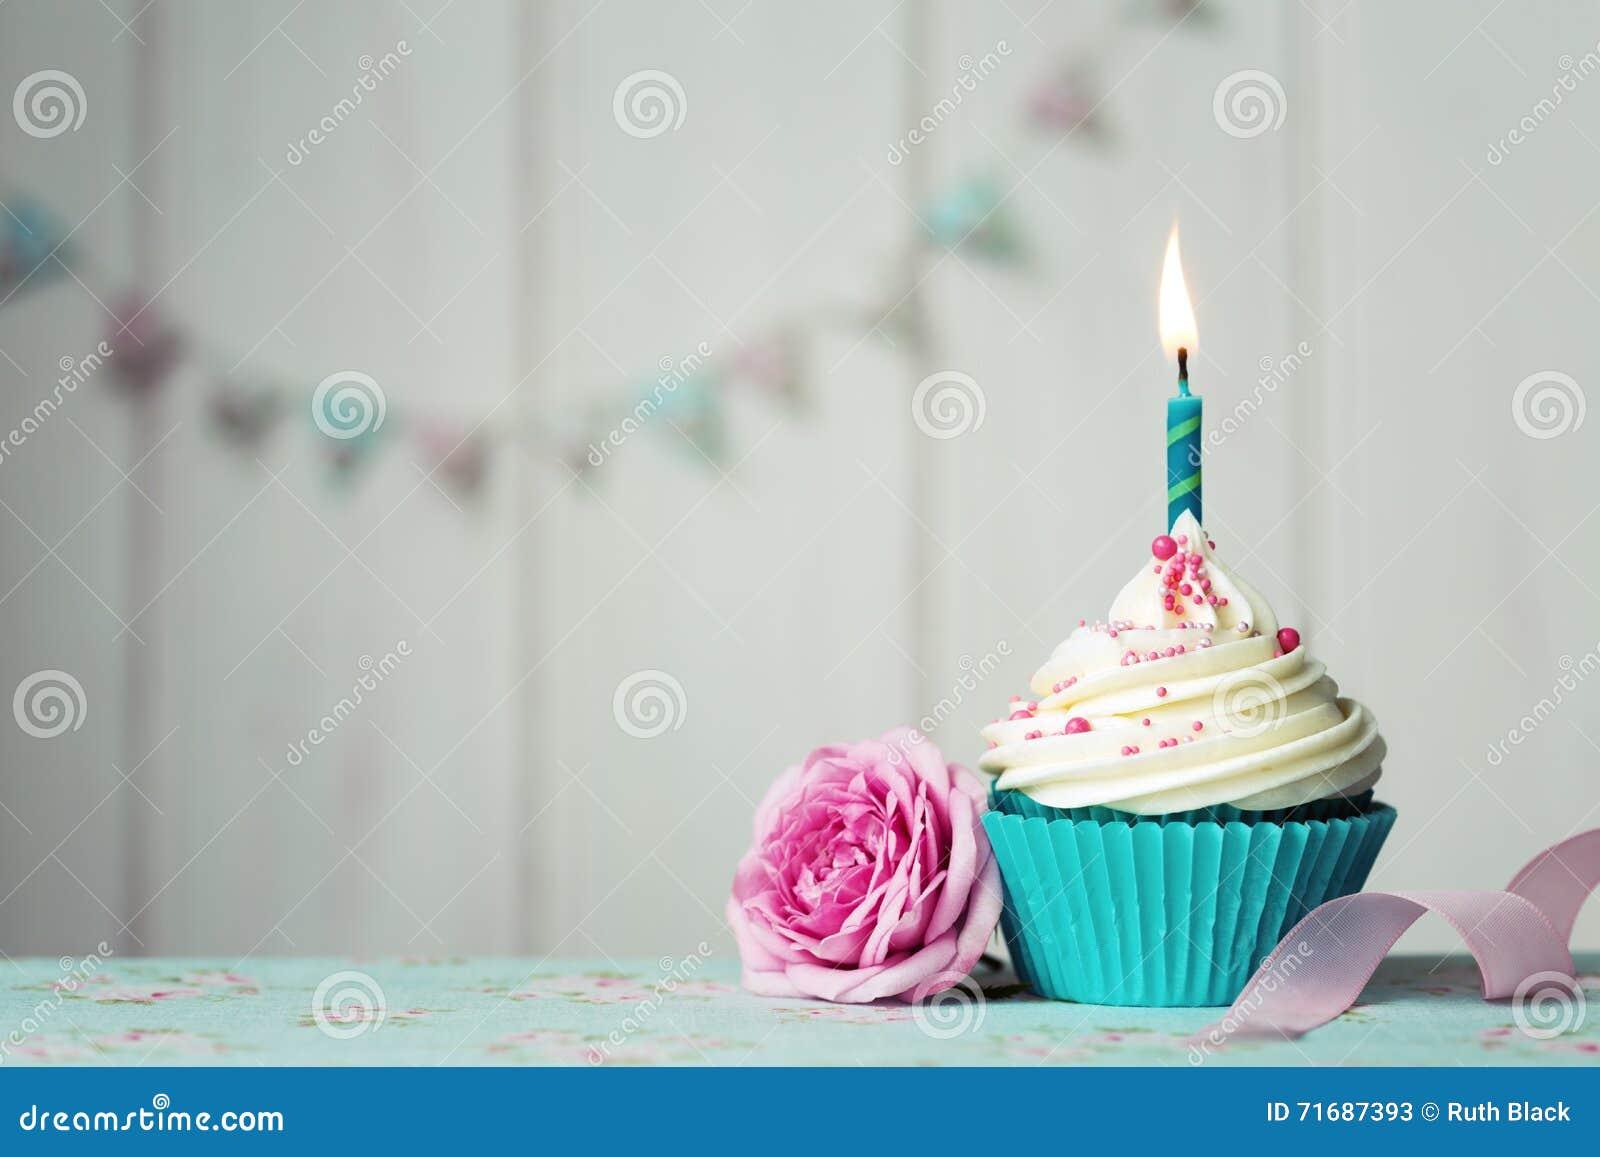 Birthday Cupcake Stock Photo Image 71687393